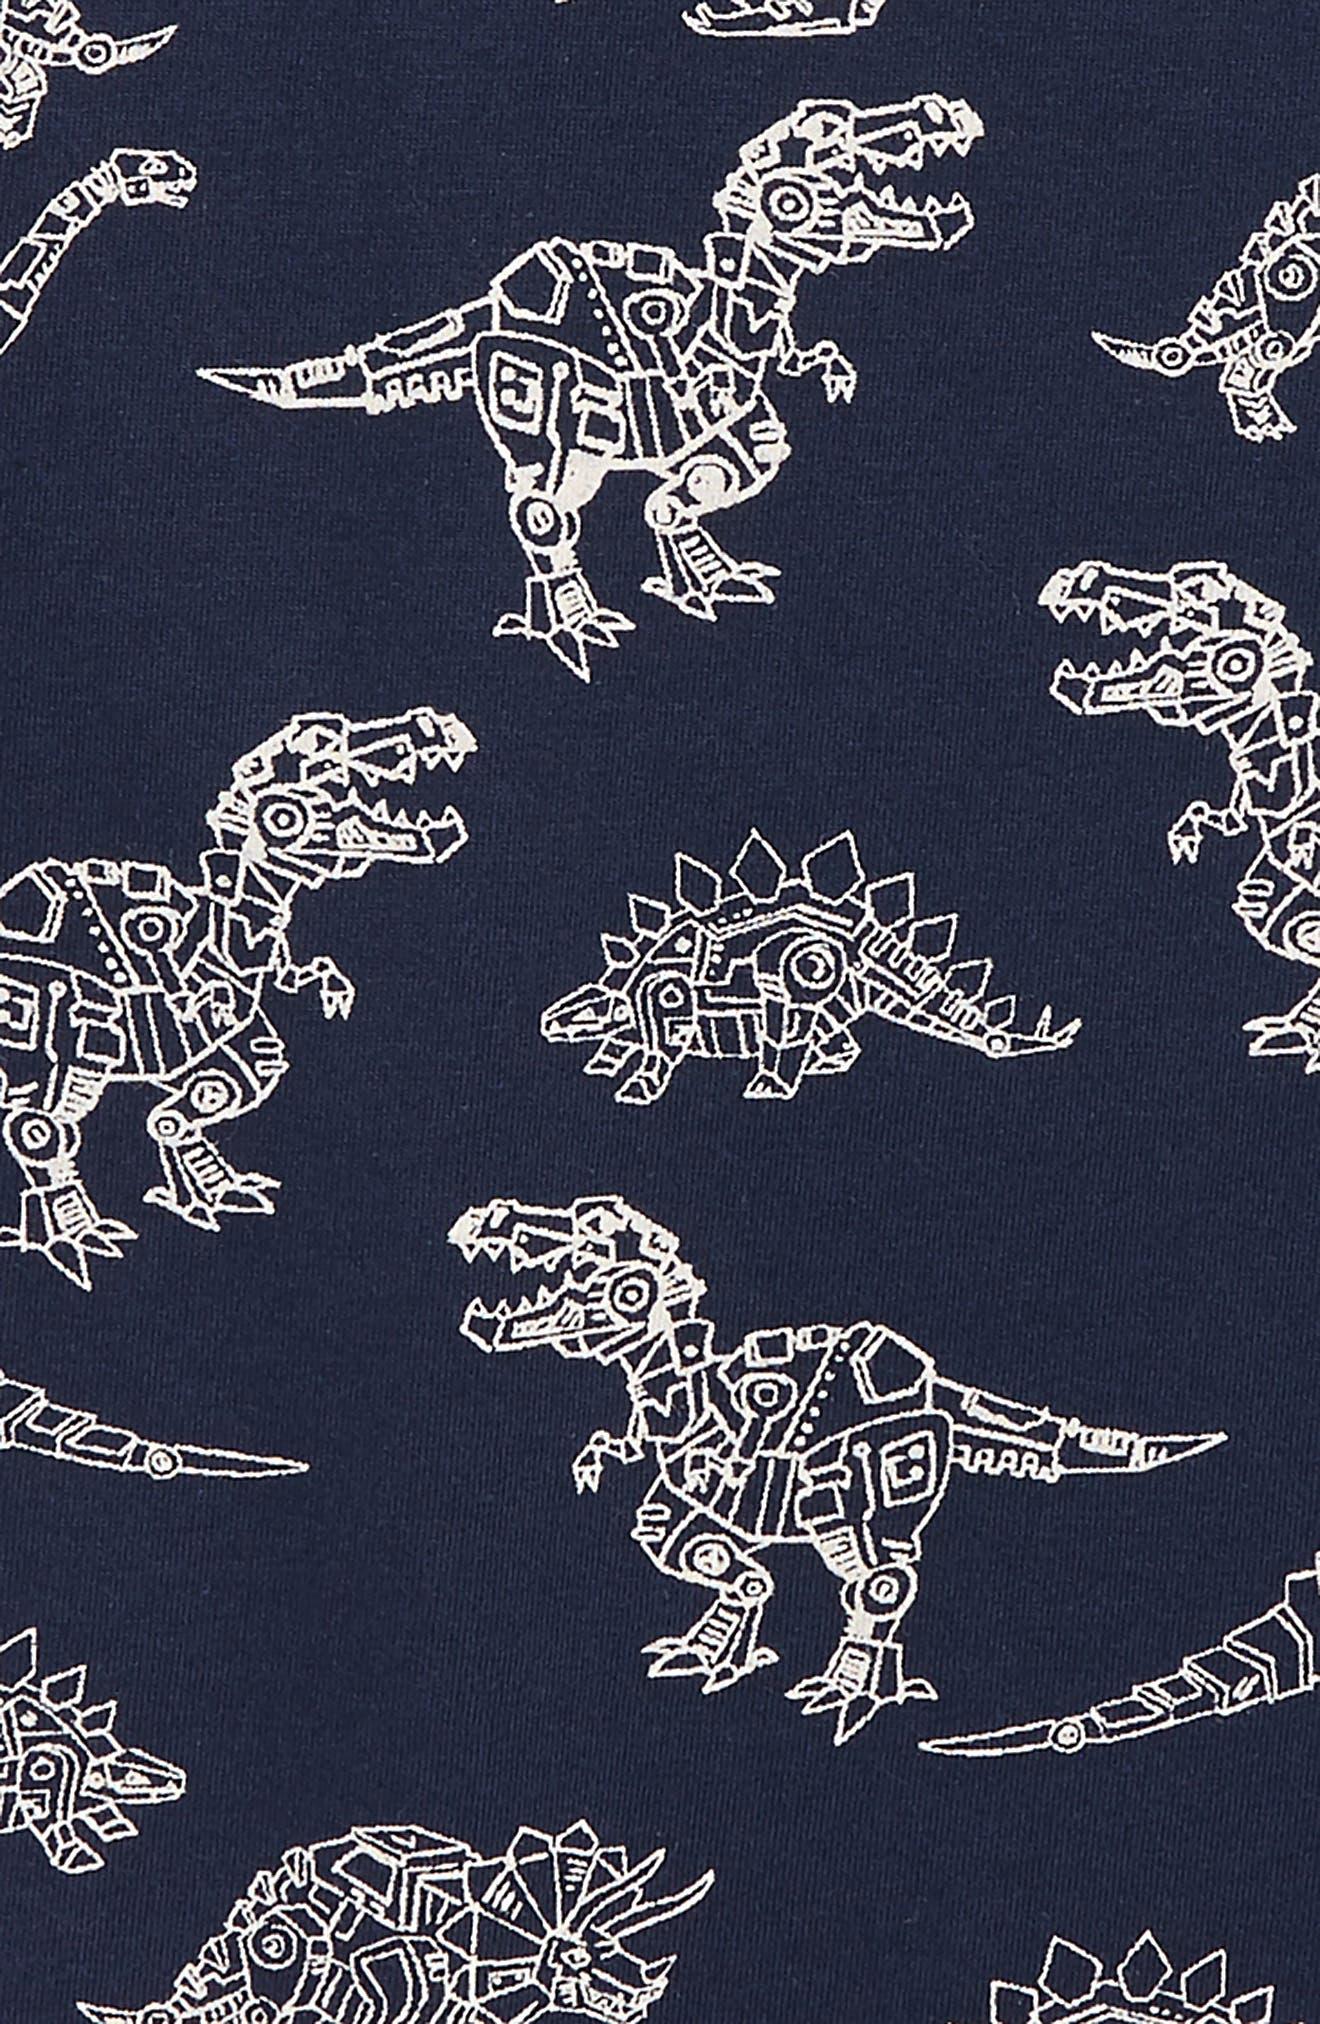 Robotic Dino Print T-Shirt,                             Alternate thumbnail 2, color,                             400